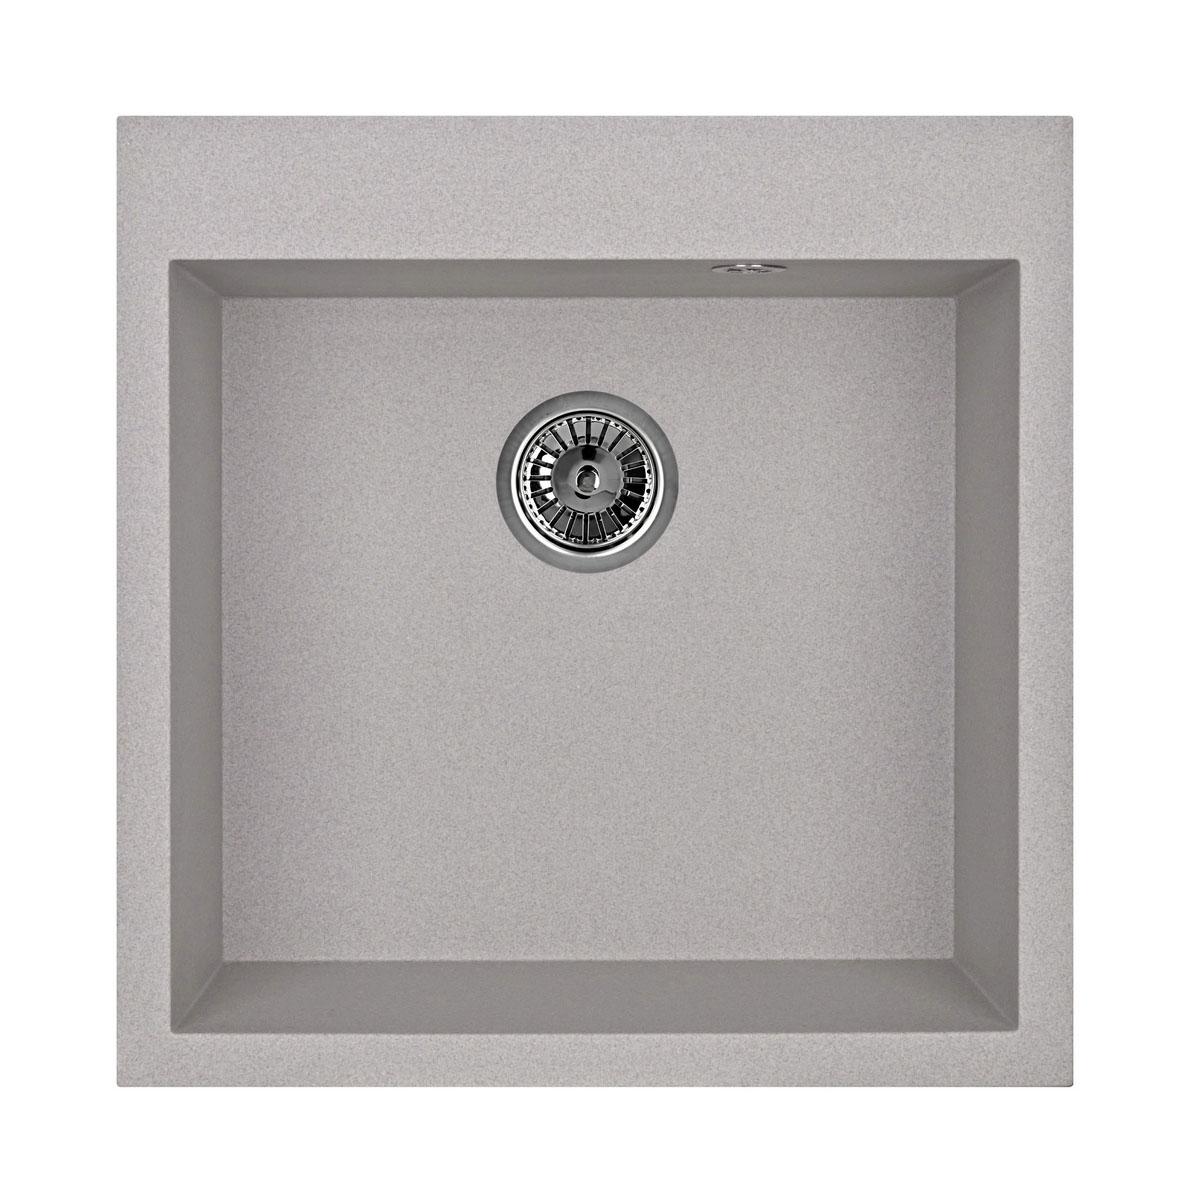 Кухонная мойка Granula GR-5102 505х510 базальт цена